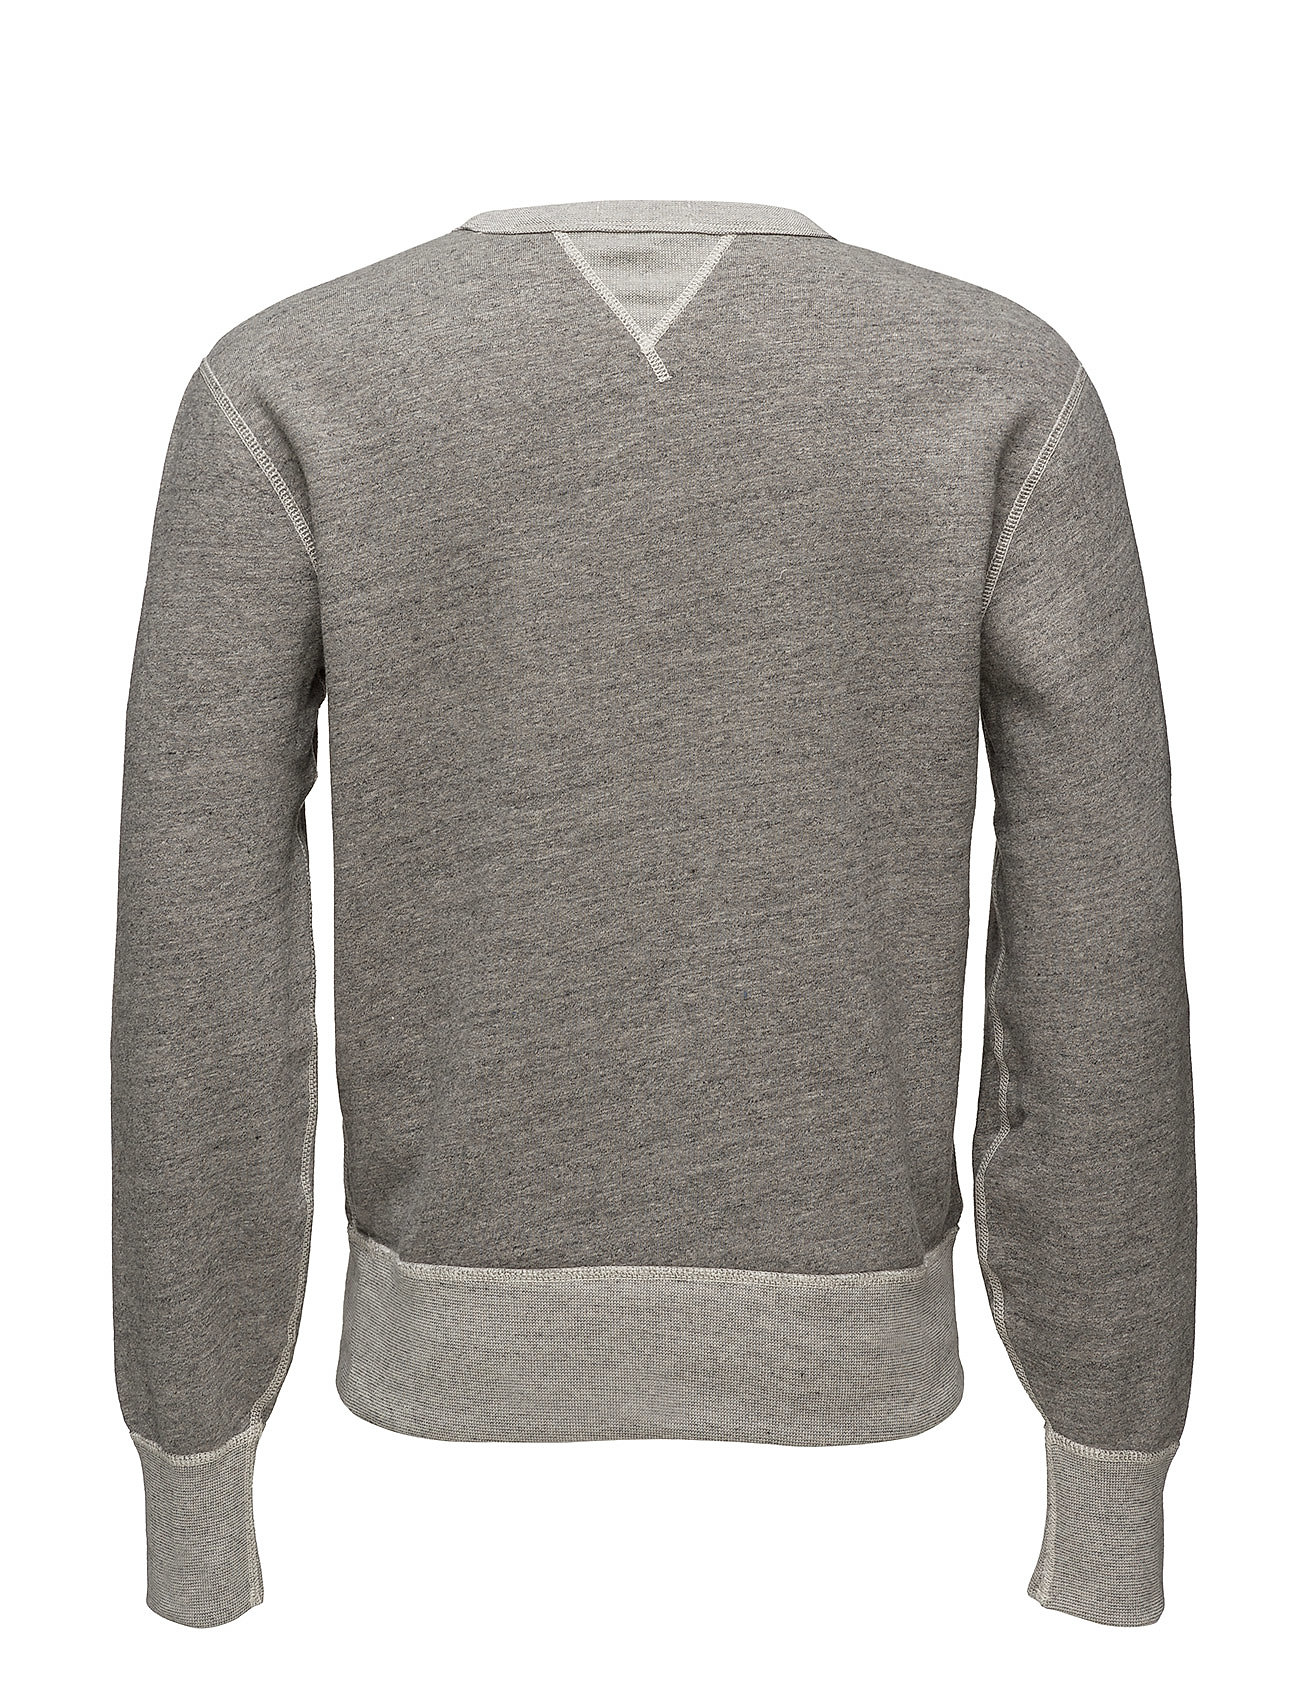 fleece Sweatshirtbattalion HeatherPolo Lauren Ralph blend Cotton xoBrdCe